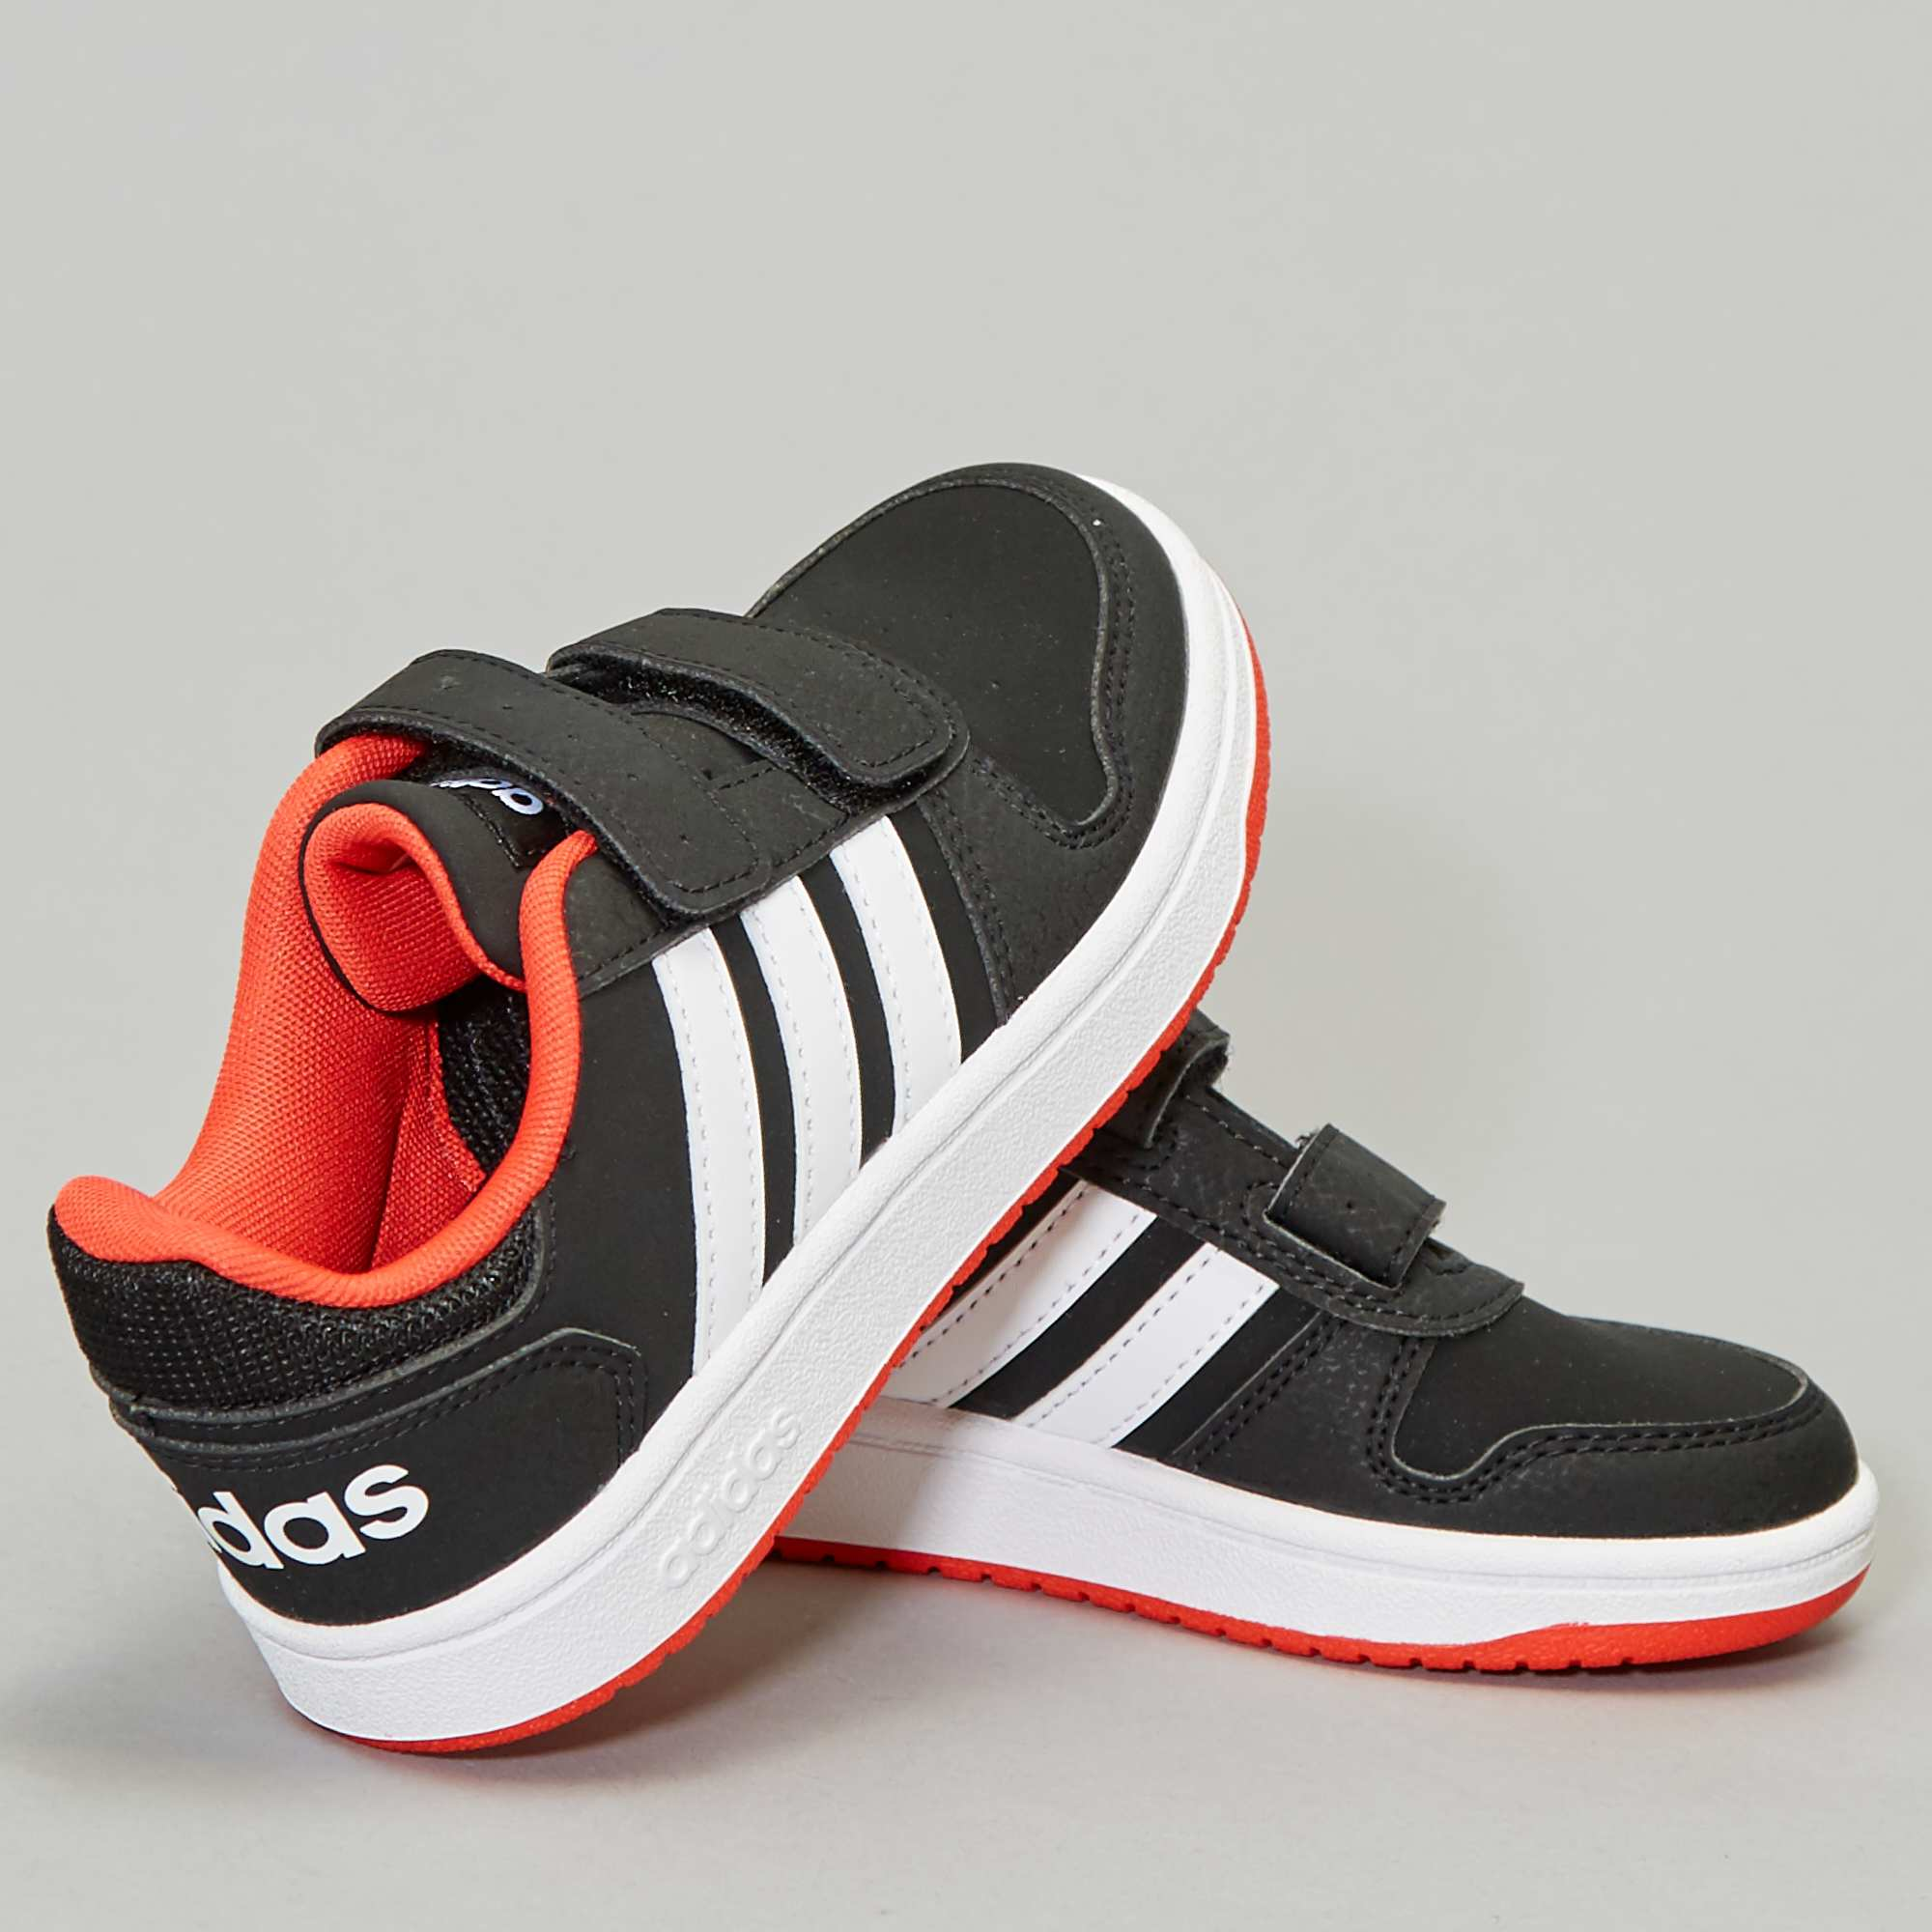 ee04e4abeb30 Baskets 'adidas hoops' basses Chaussures - noir/rouge - Kiabi - 35,00€